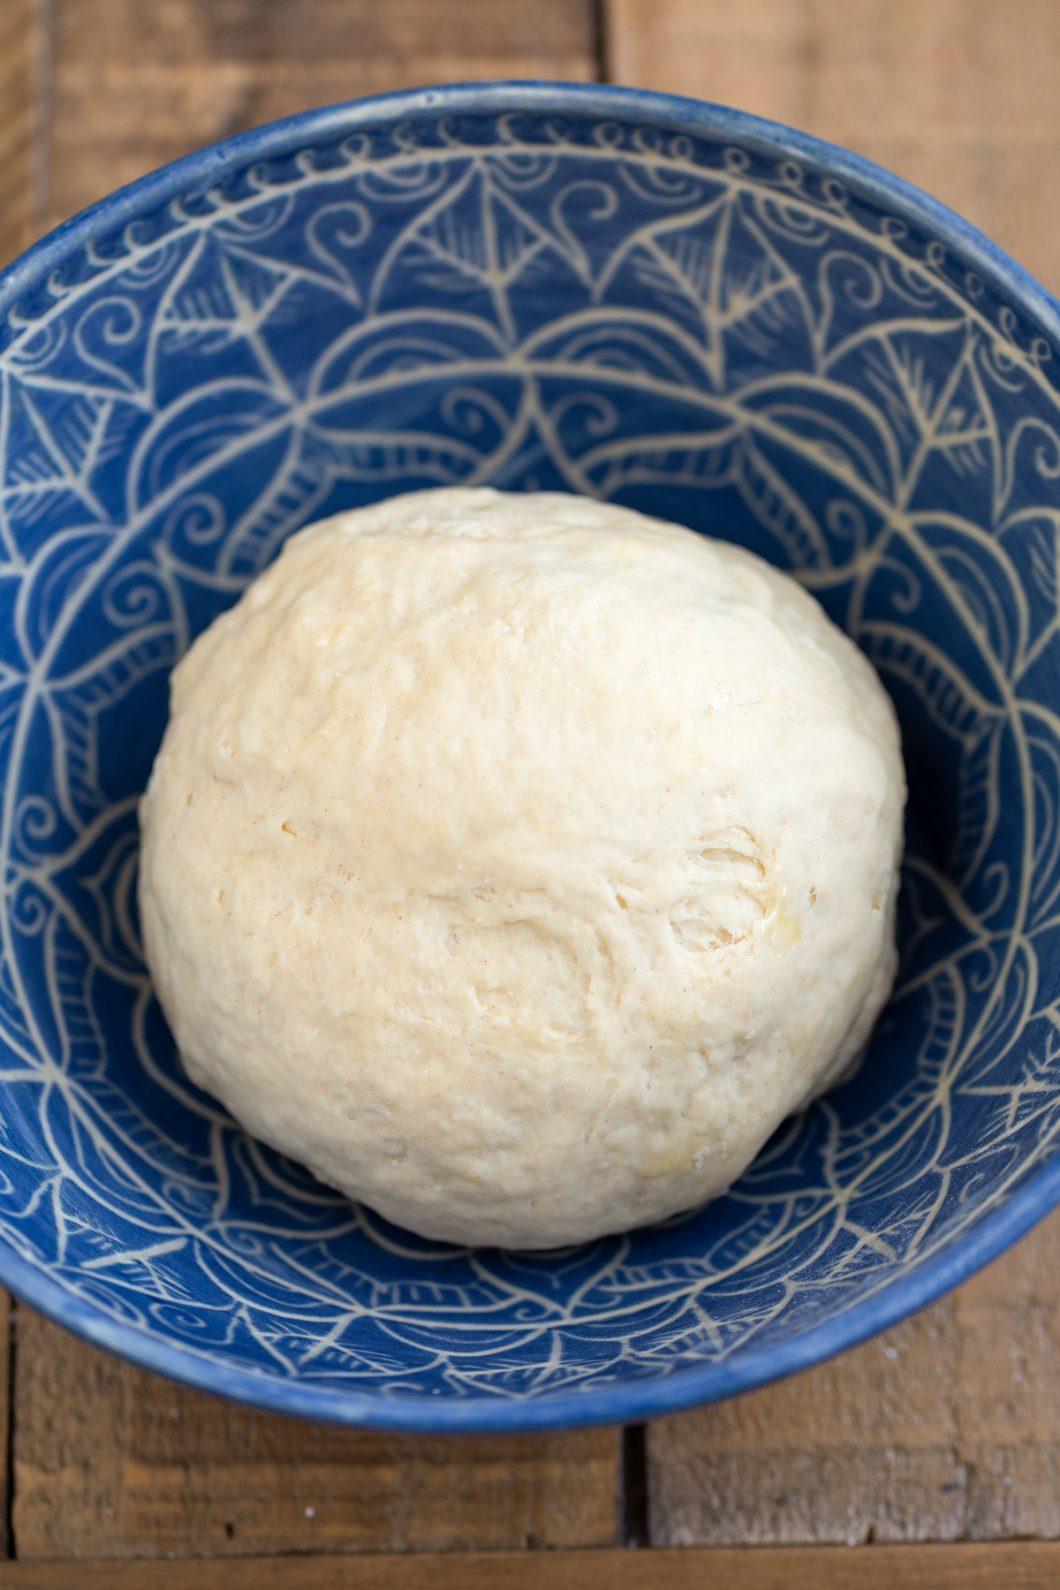 Pizza dough ball in a blue bowl.